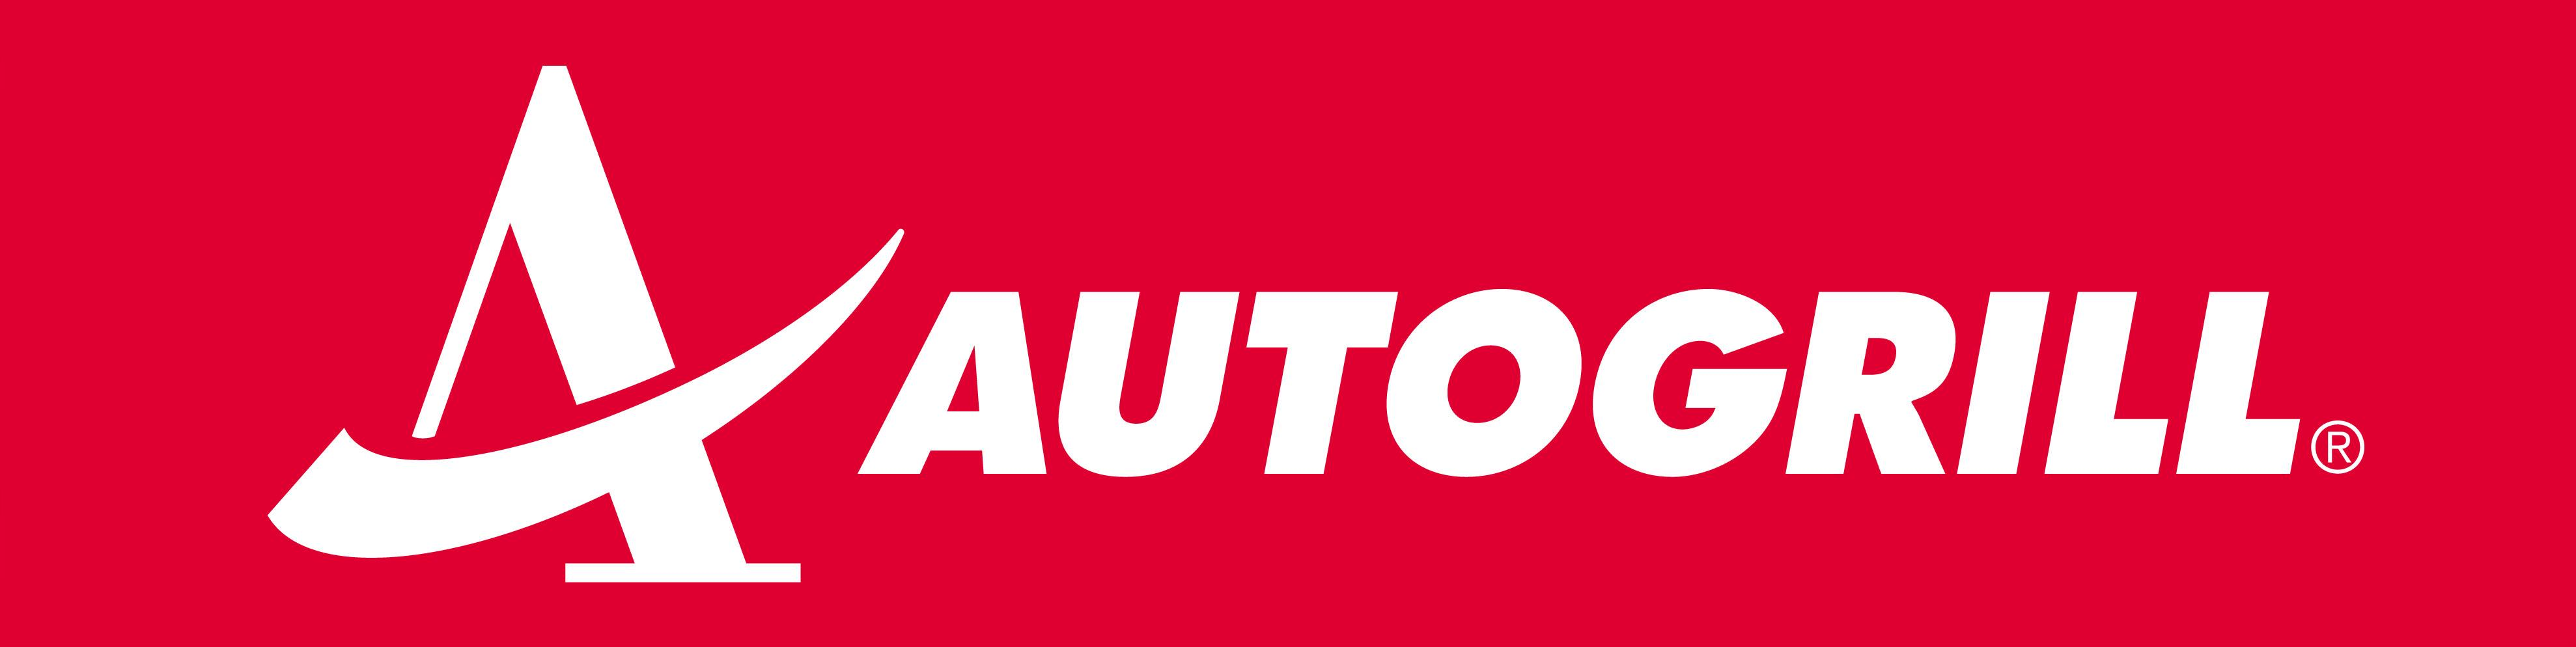 autogrill-logo